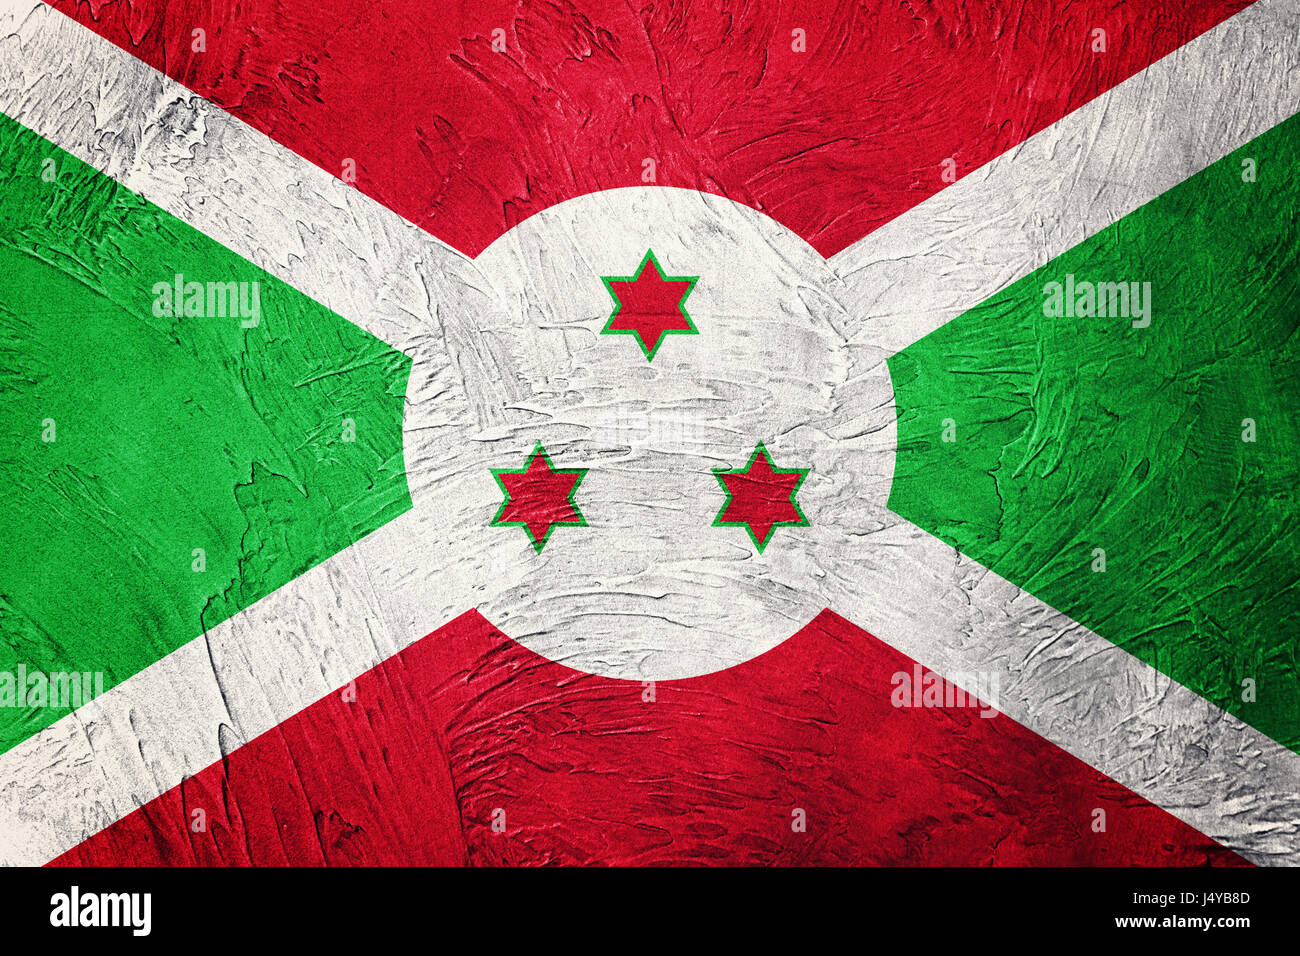 Grunge Burundi flag. Burundi flag with grunge texture. - Stock Image